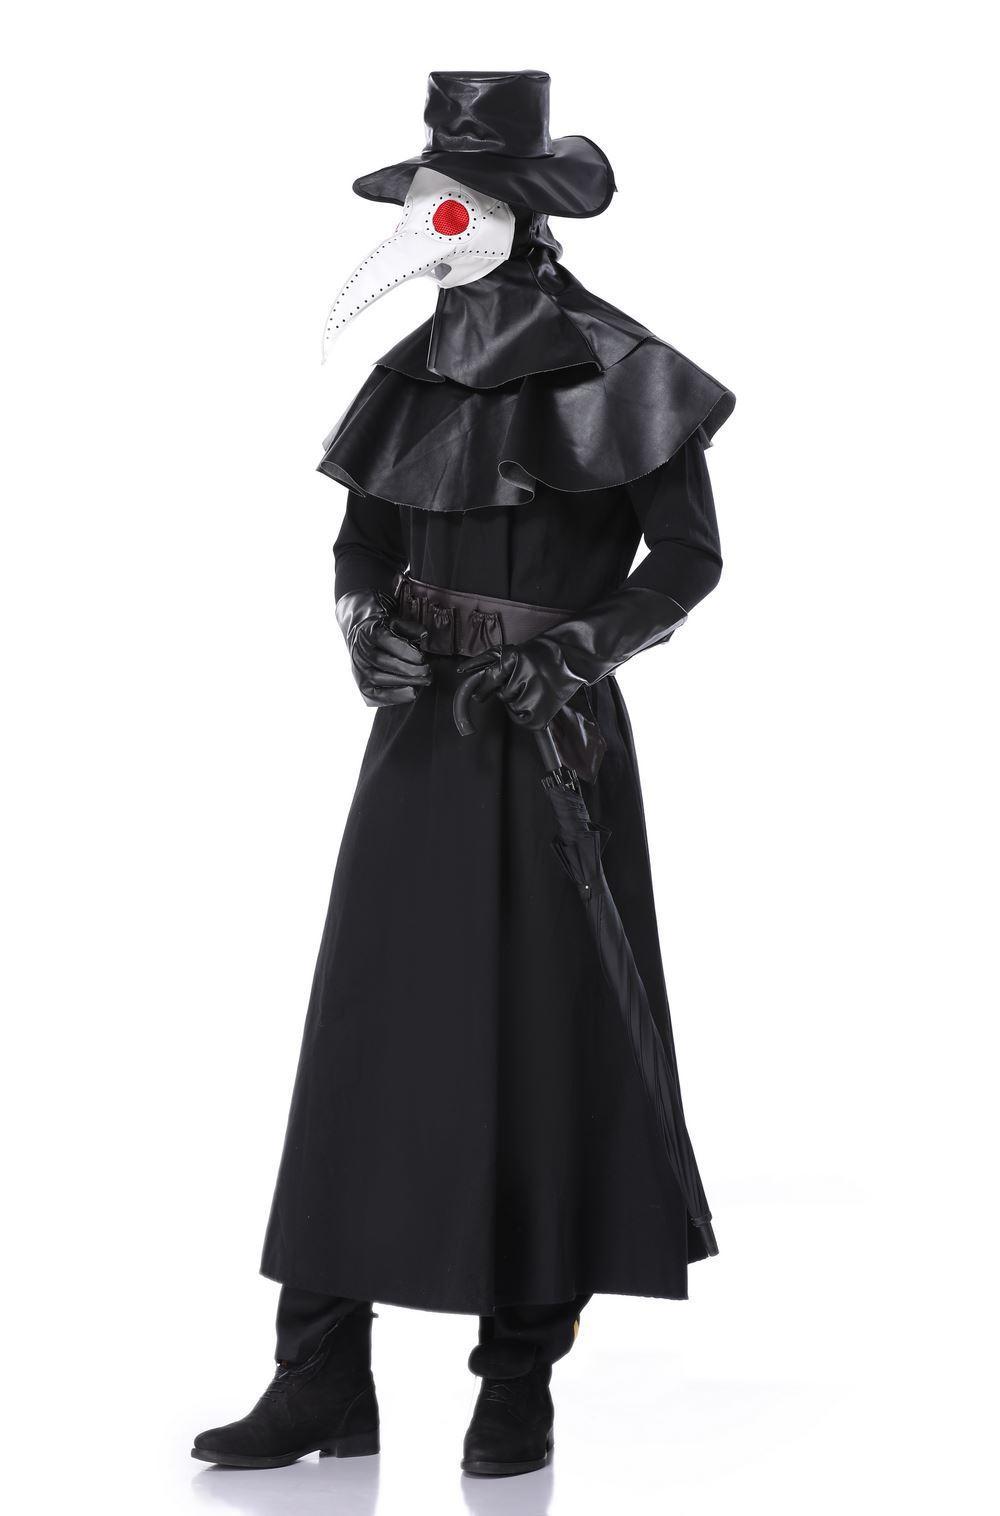 Halloween Cosplay plague beak doctor costume dark hero costume Venice carnival dress up 3